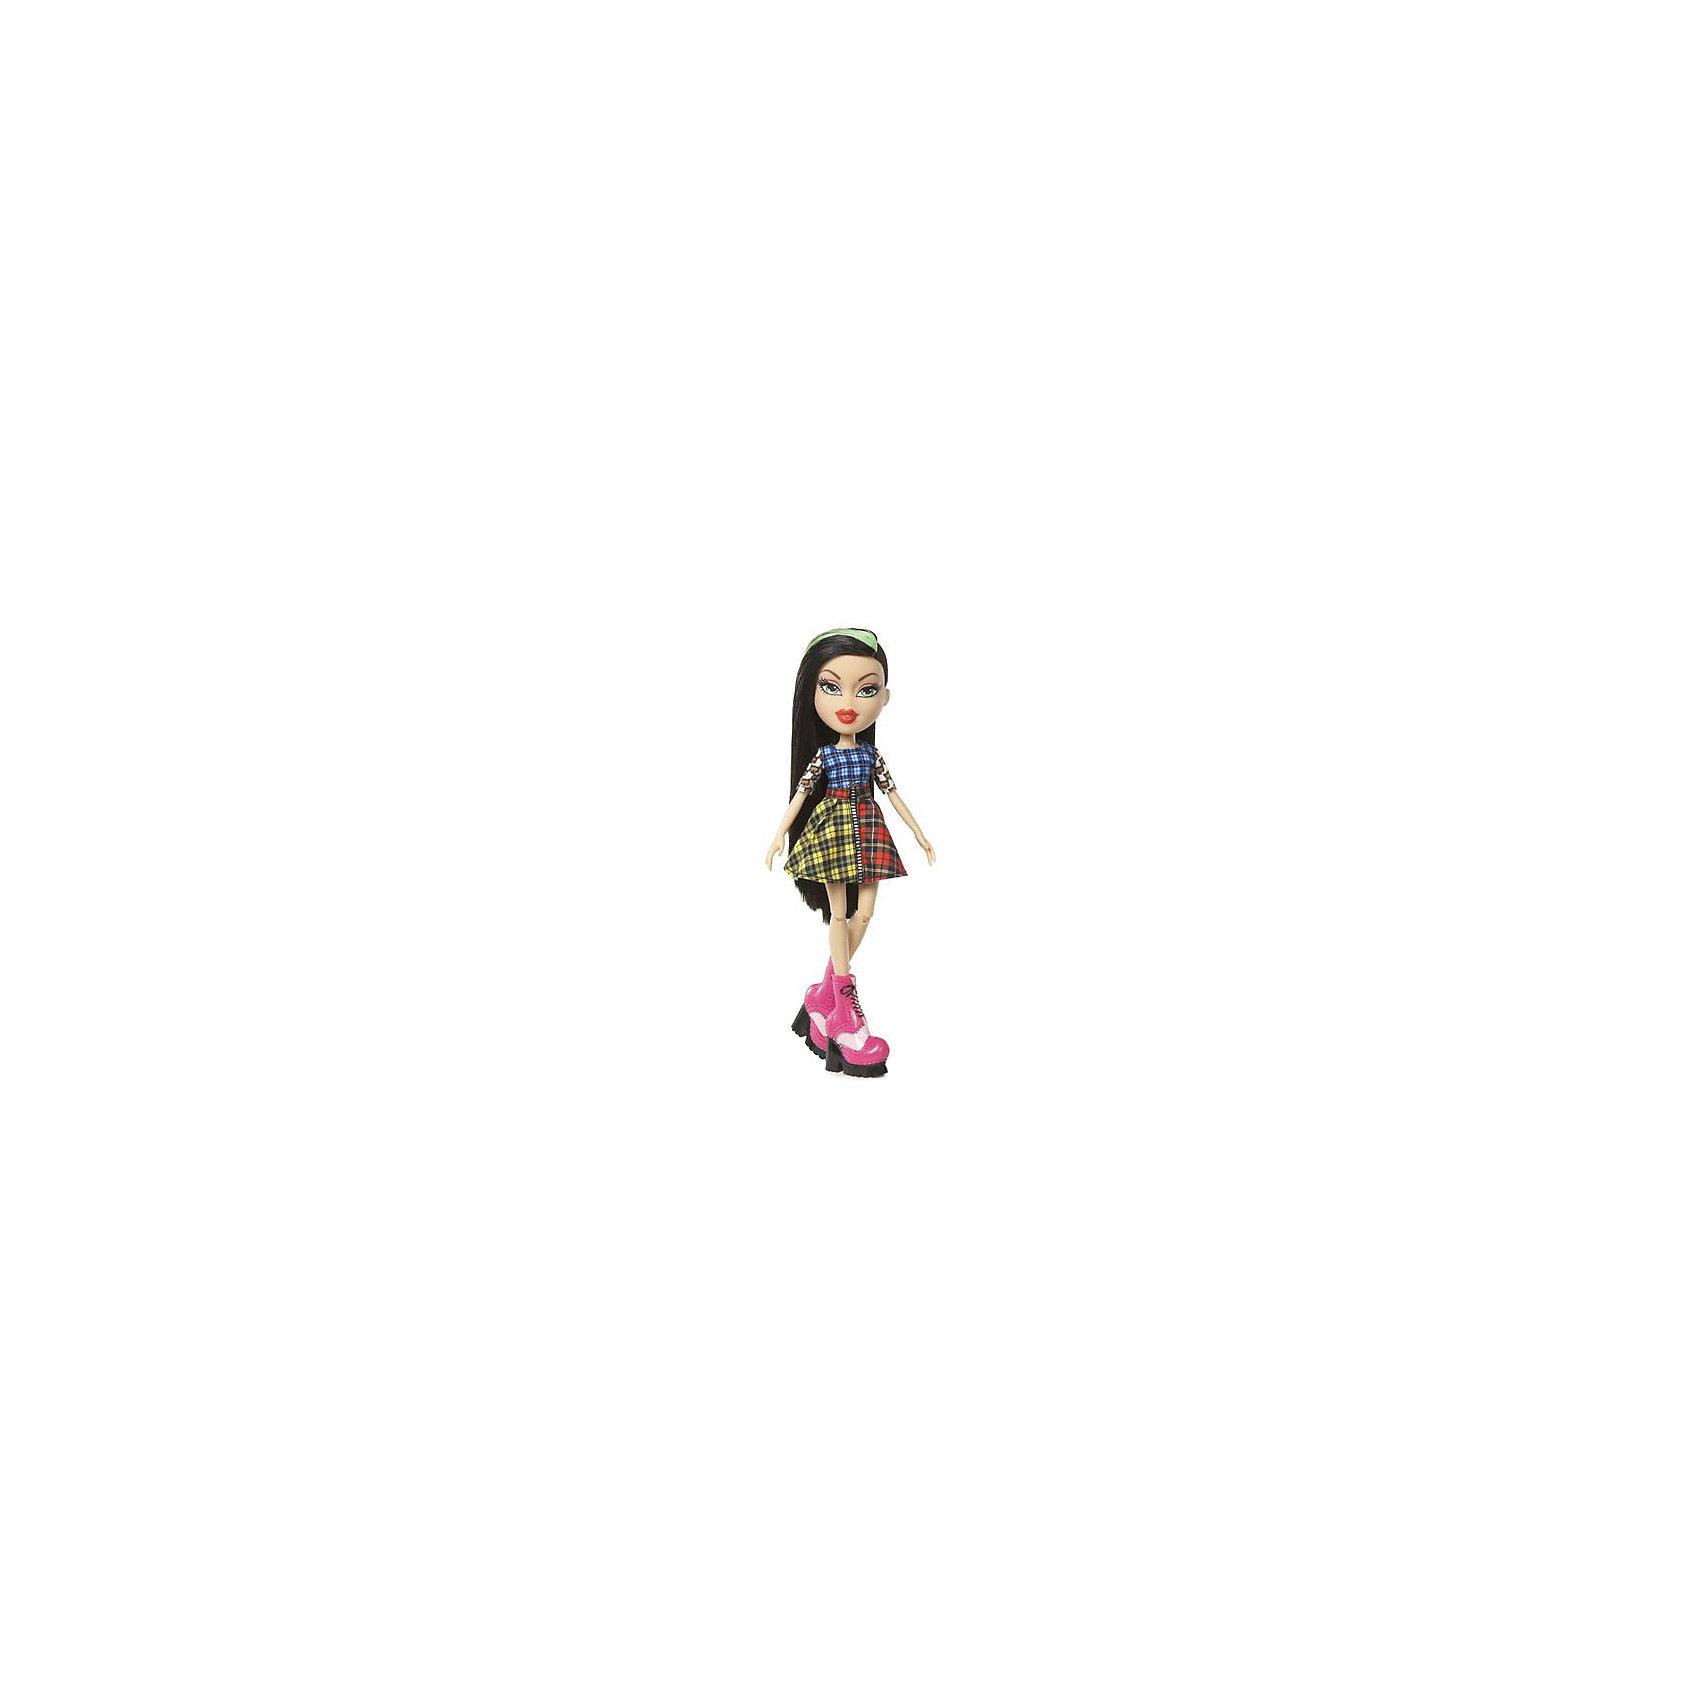 BRATZ Кукла делюкс Джей, Давай знакомиться, Bratz bratz давай знакомиться кукла делюкс хлоя